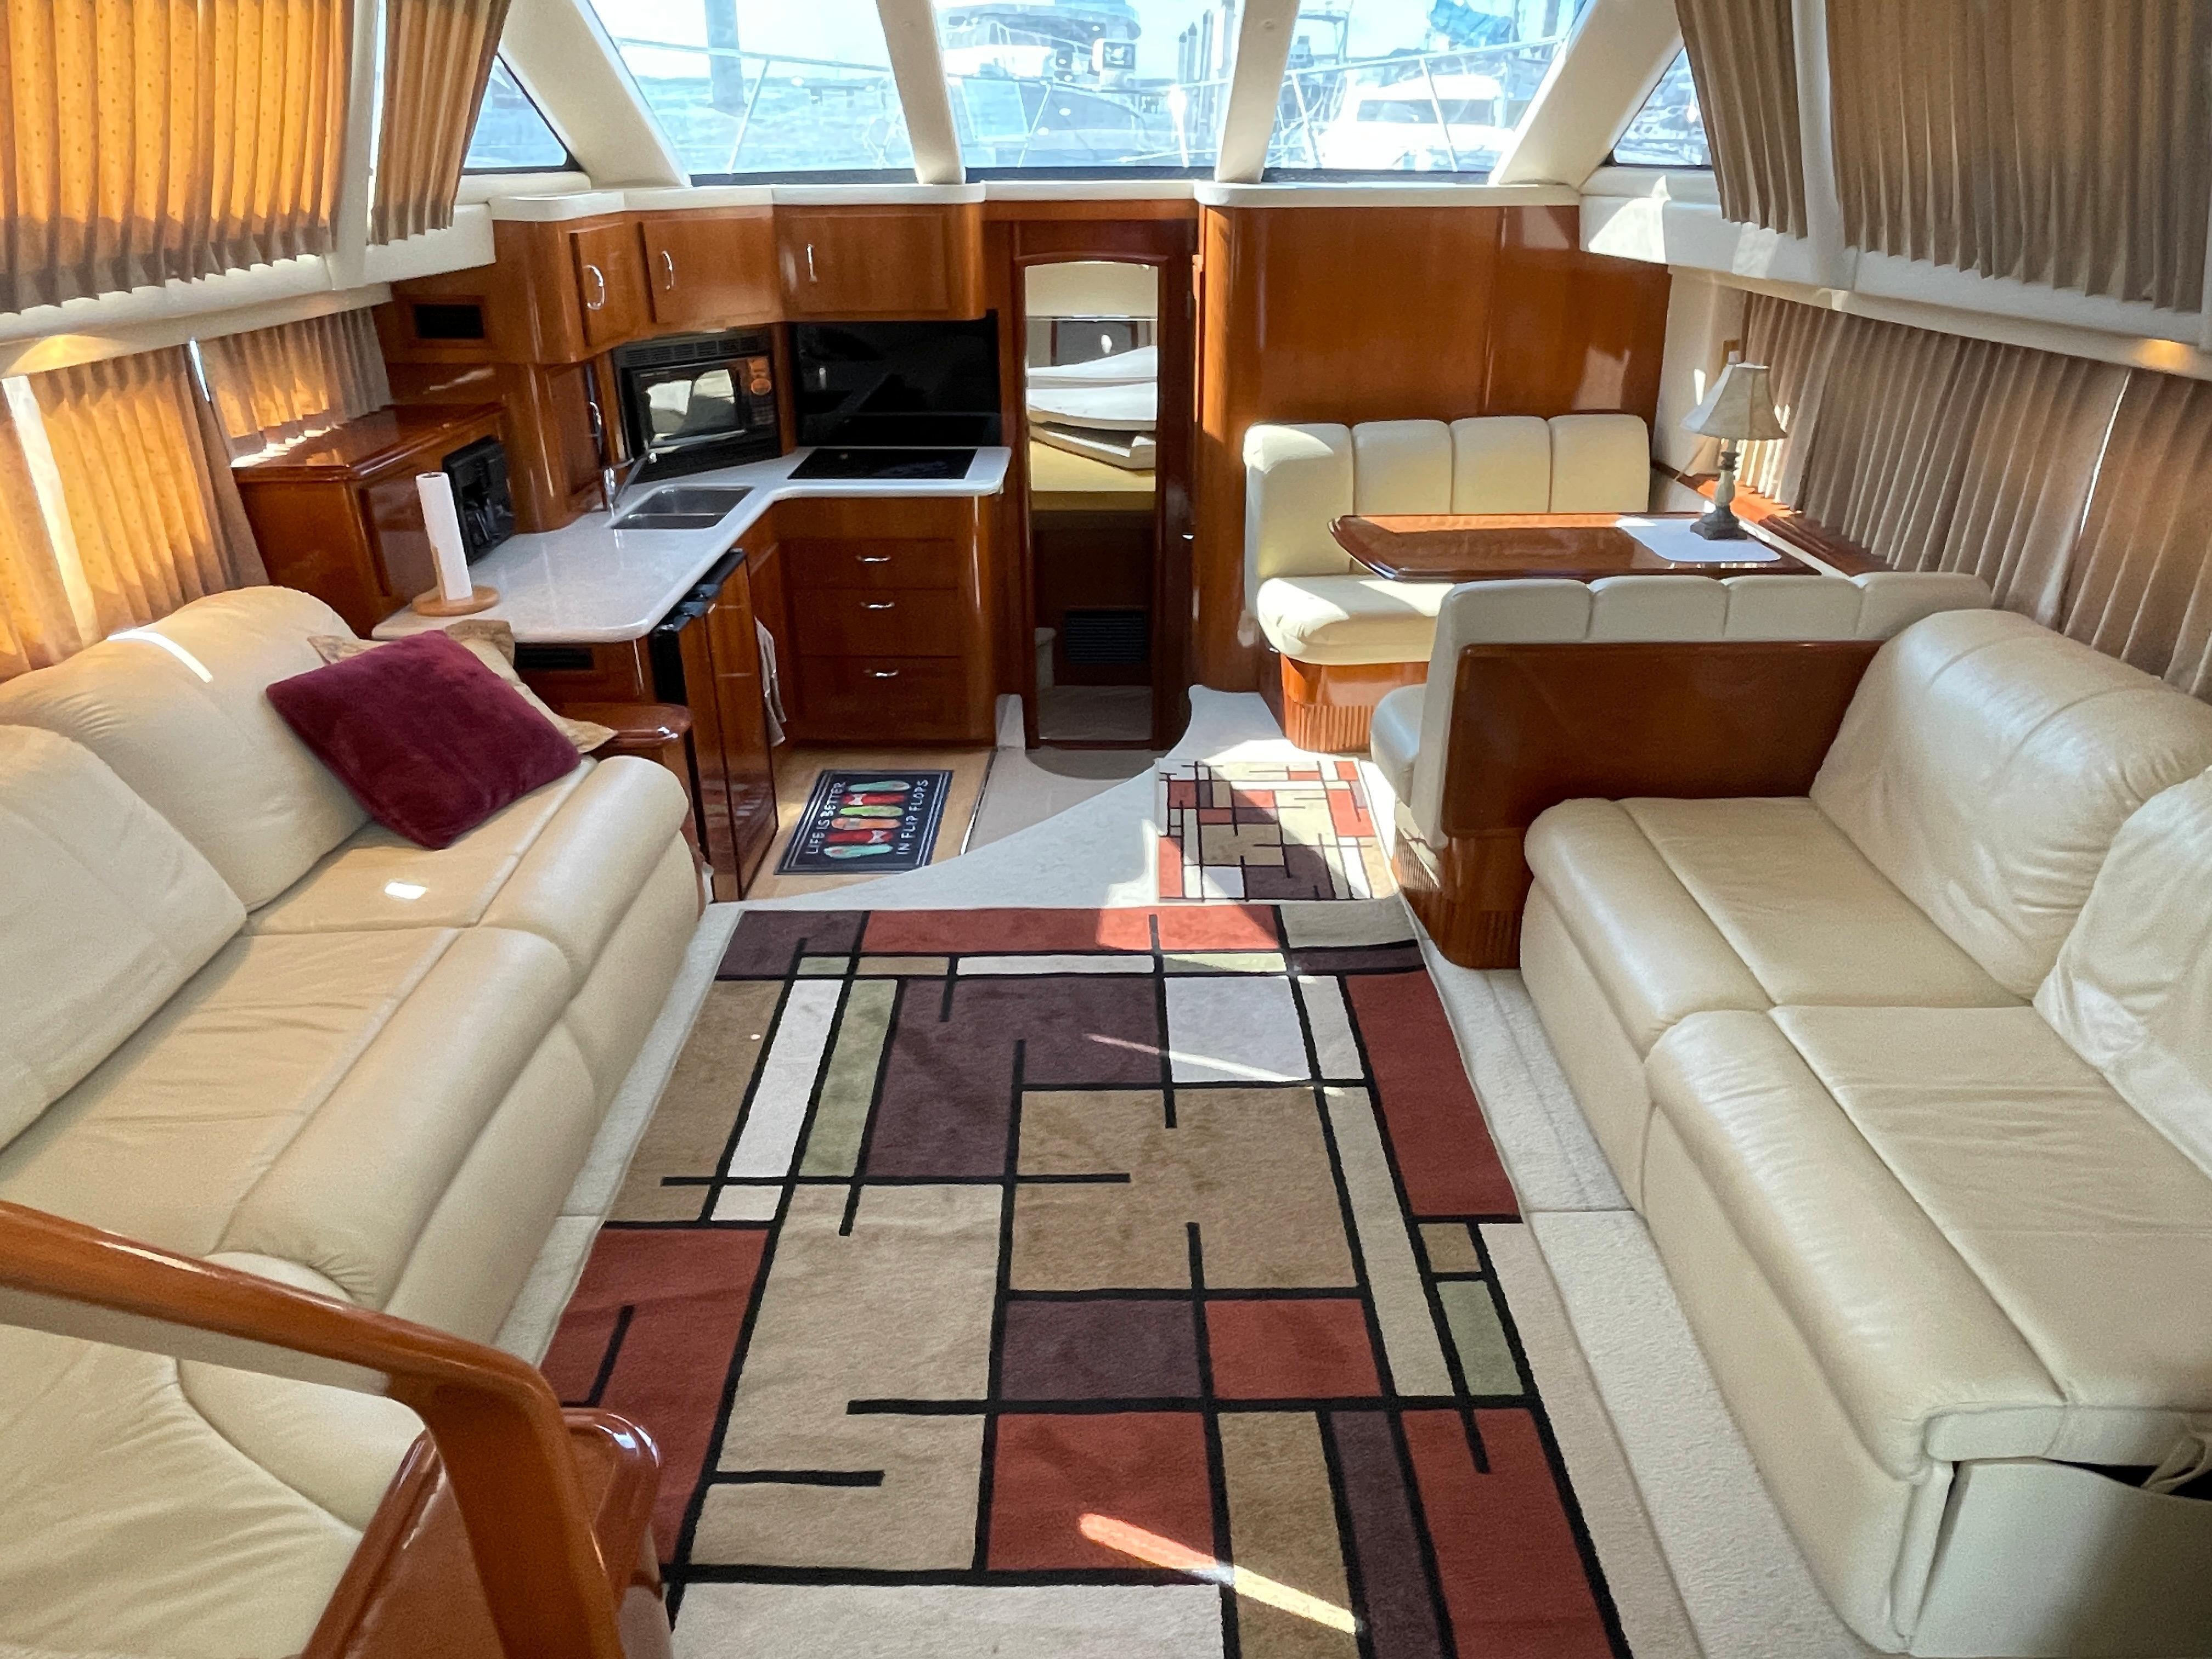 Carver 444 Cockpit Motor Yacht - Salon looking forward